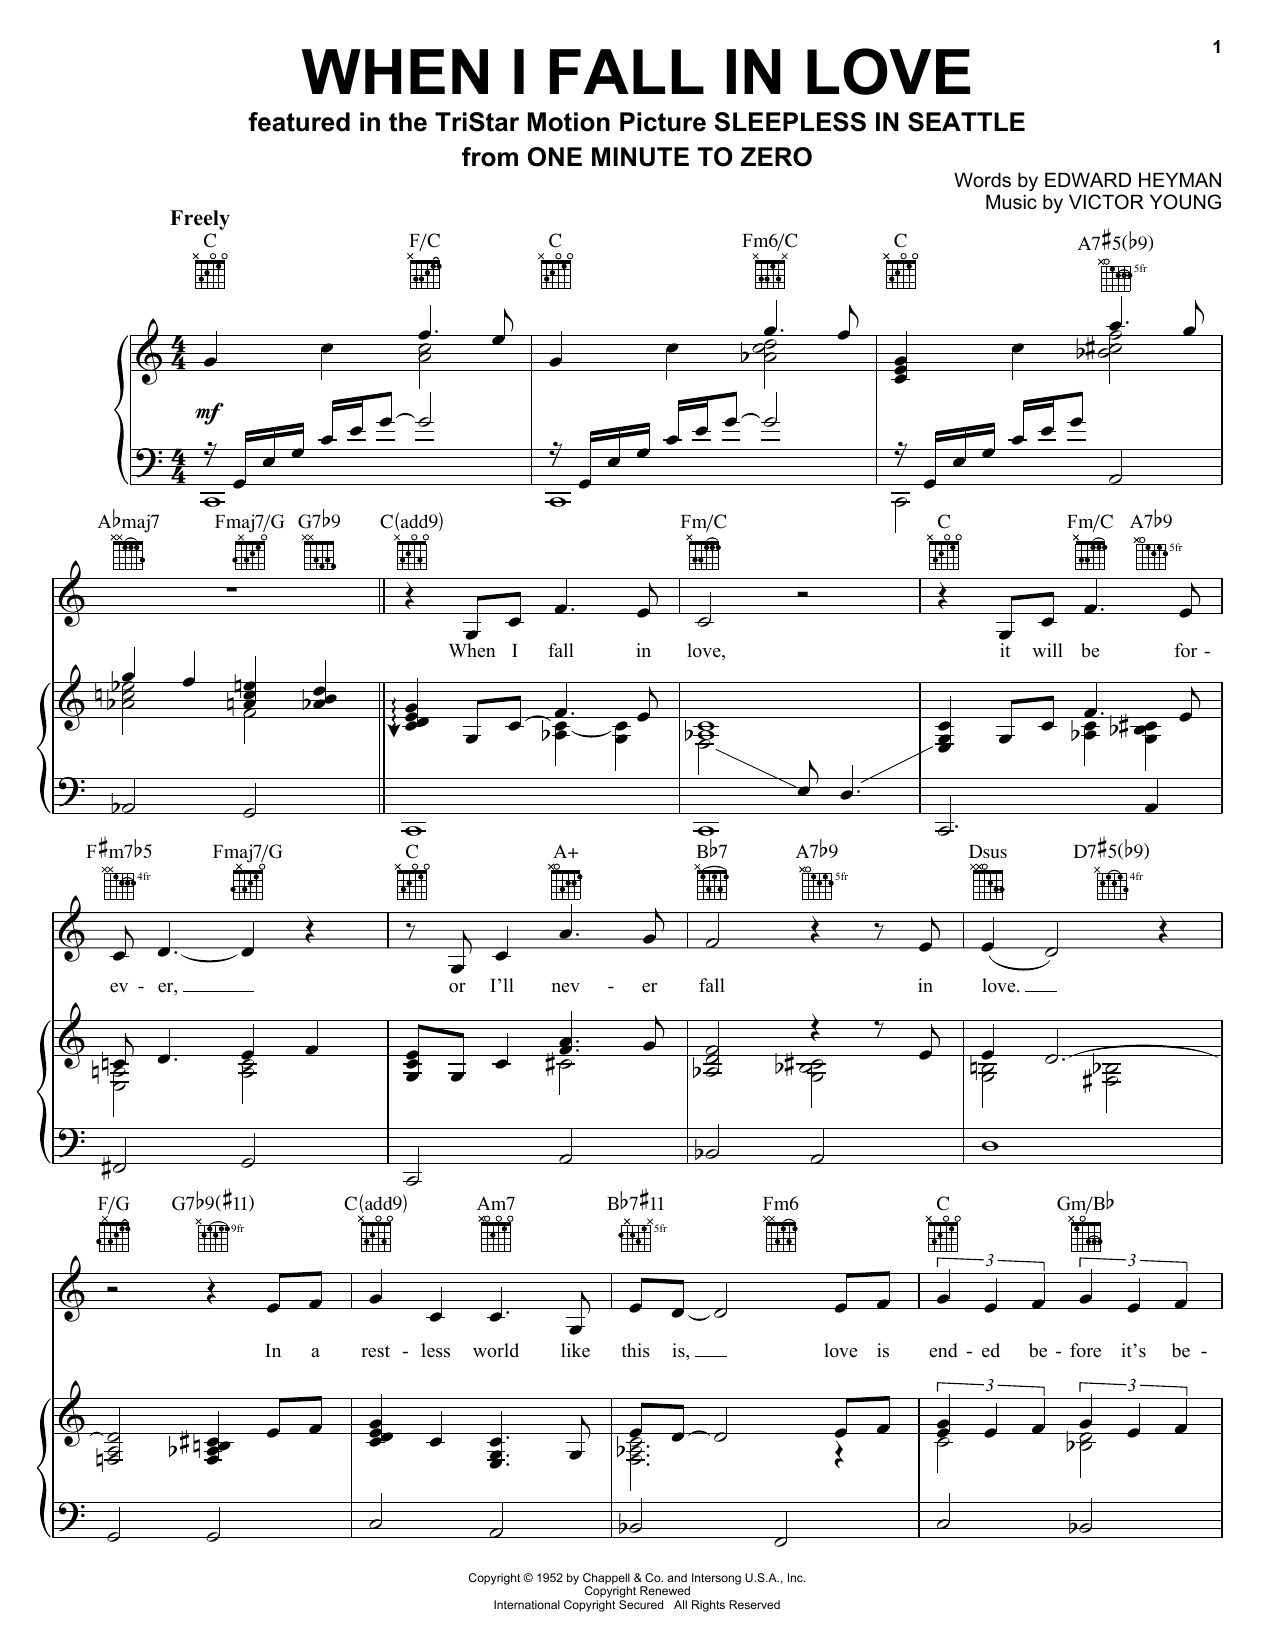 When I Fall In Love sheet music